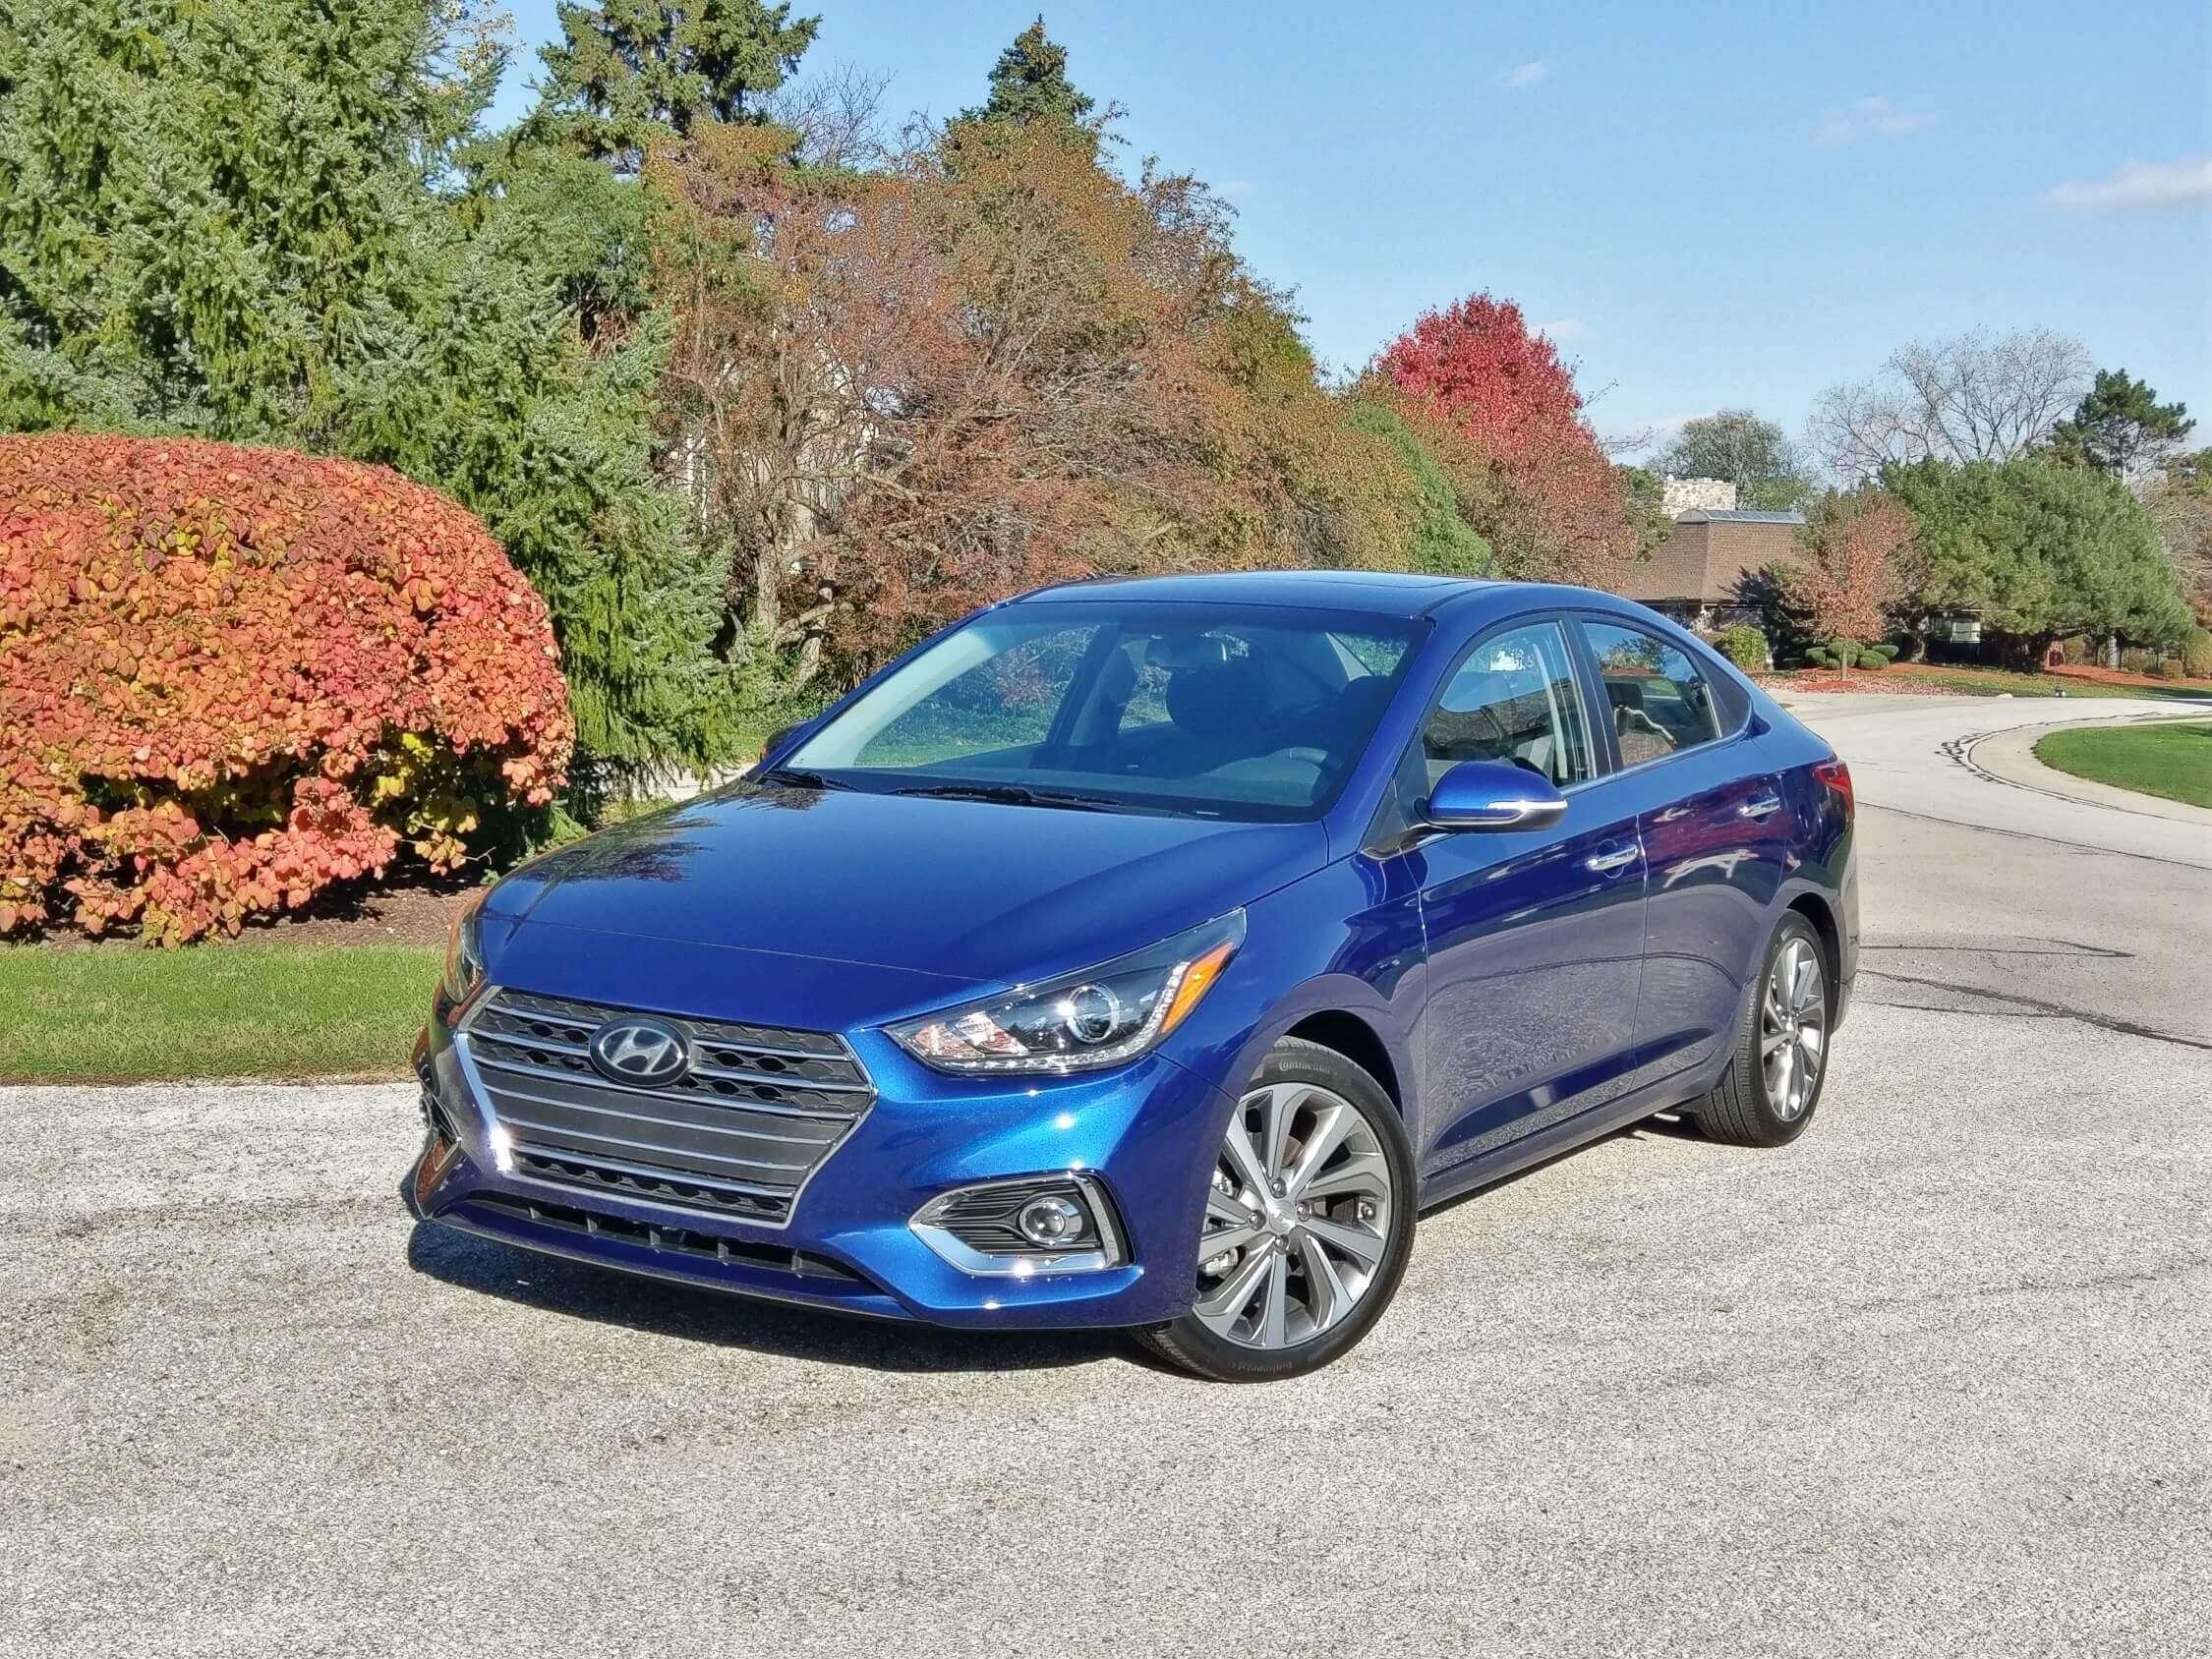 2018 Hyundai Accent Limited Roadblazing Dhs Budget Small Sedan Review Roadblazing